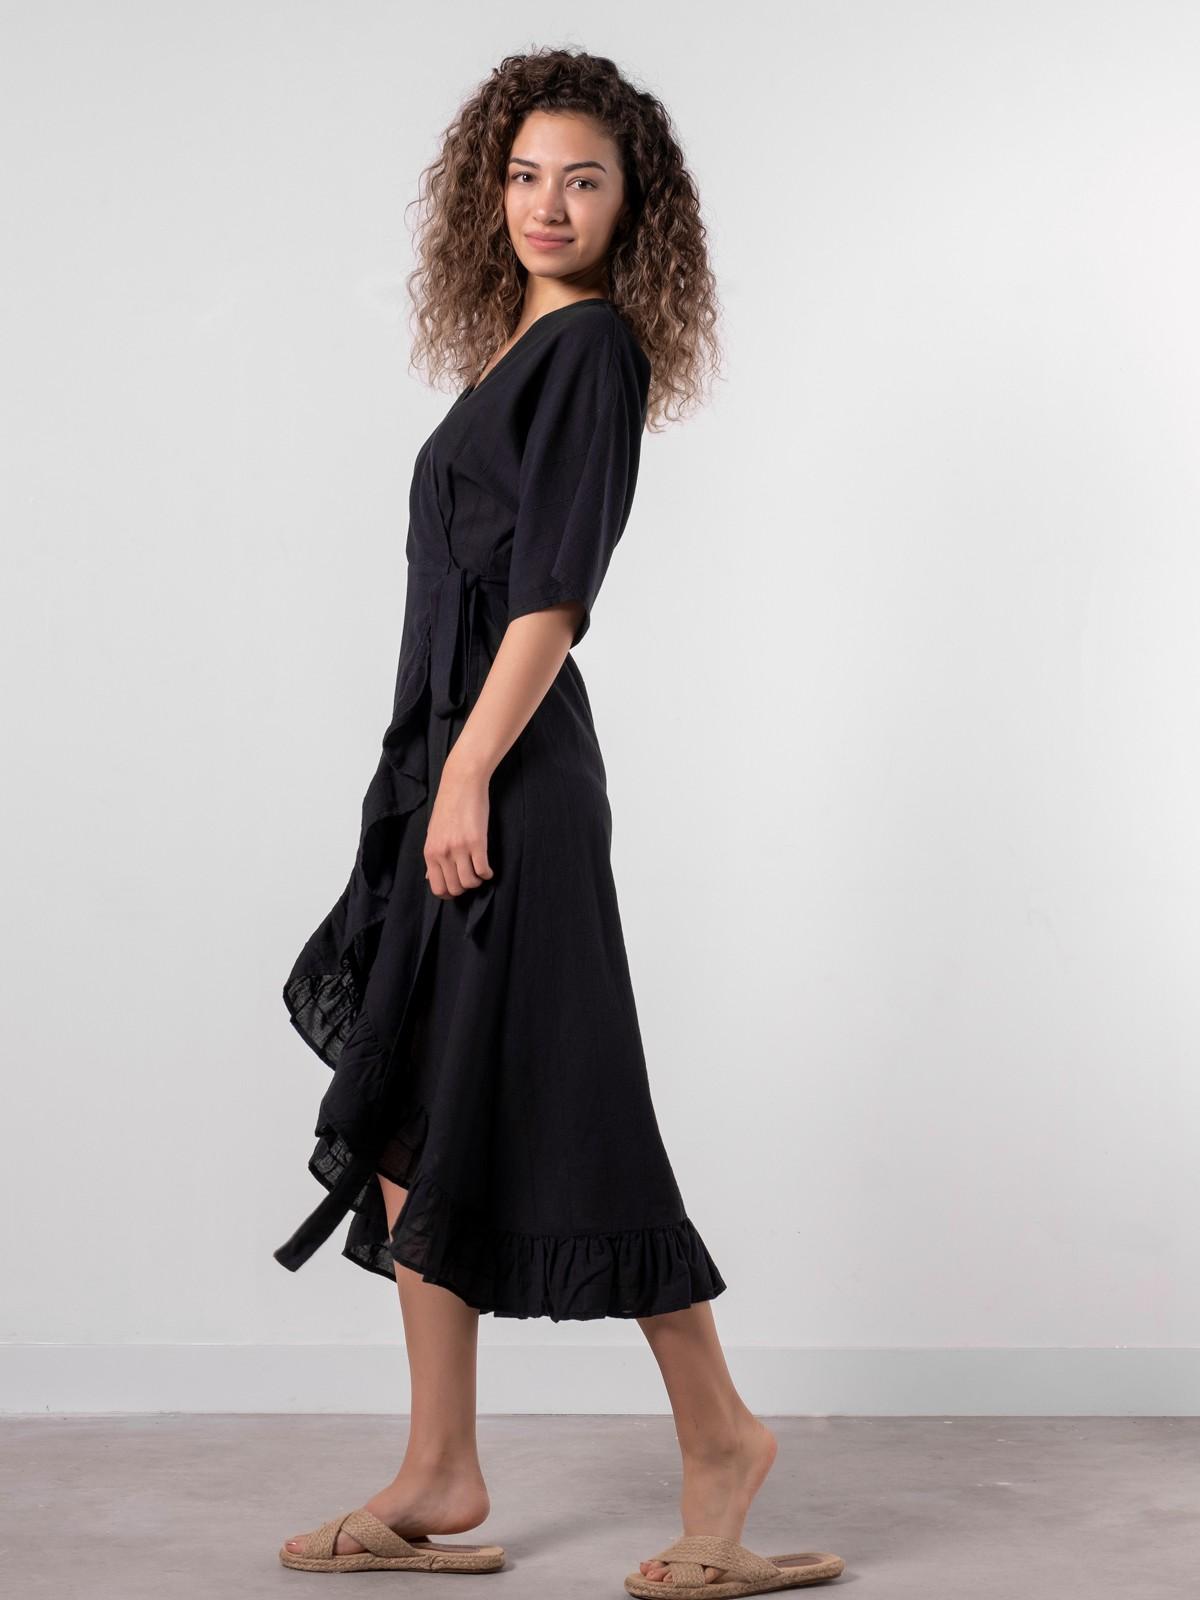 frilled-dress-siyah2-1200x1600w